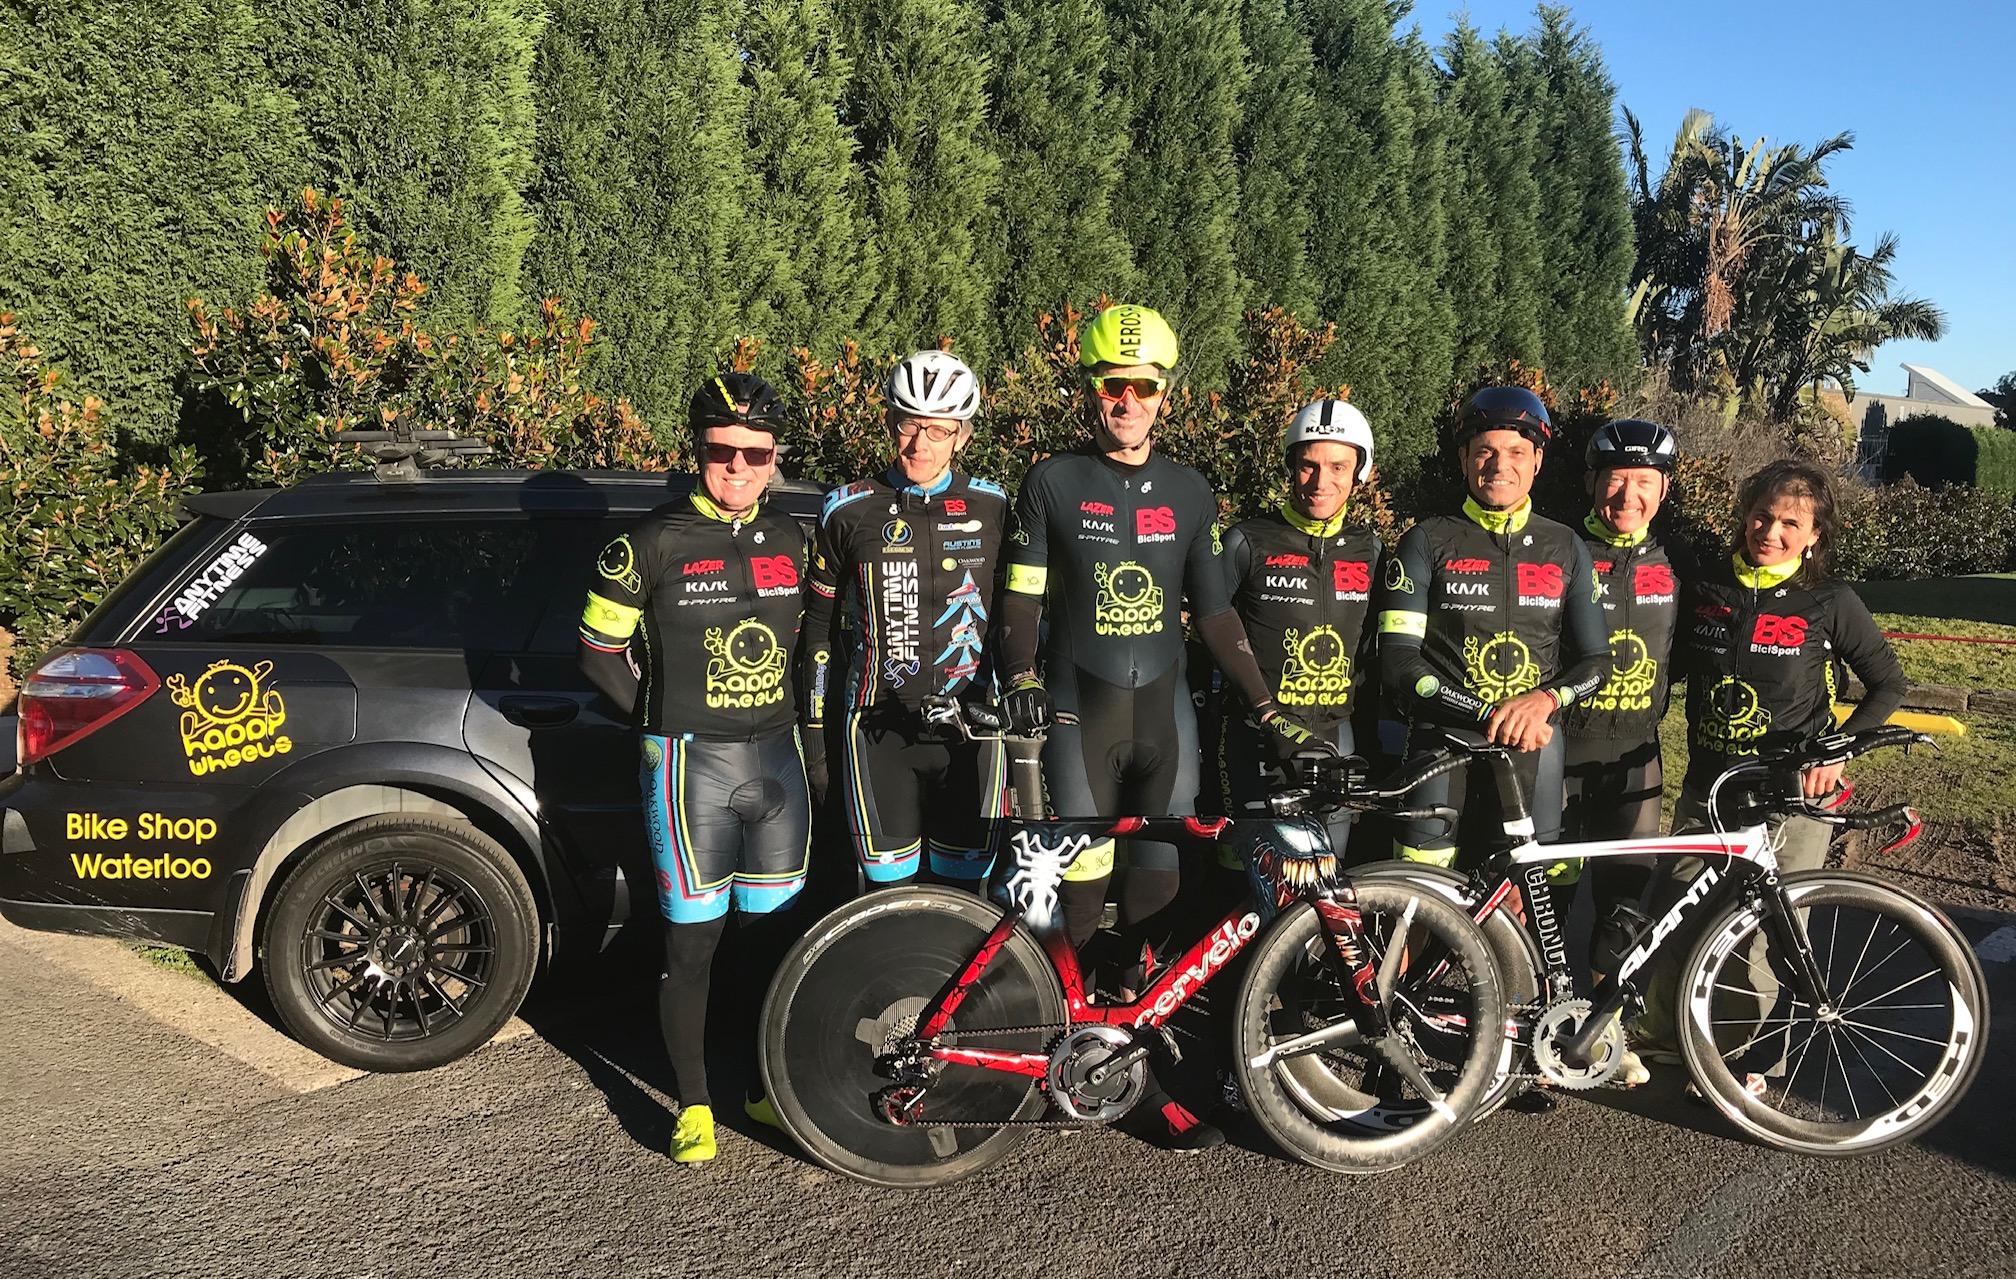 BiciSport Team Time Trial Training @ Terrey Hills @ 21 July - L to R … Davide Van Der Browne, Peter Verhoeven, Stewart Campbell, Randolph Baral, Dom Zumbo, Graham Cockerton, Suzy Ladanyi (HW Team Manager)